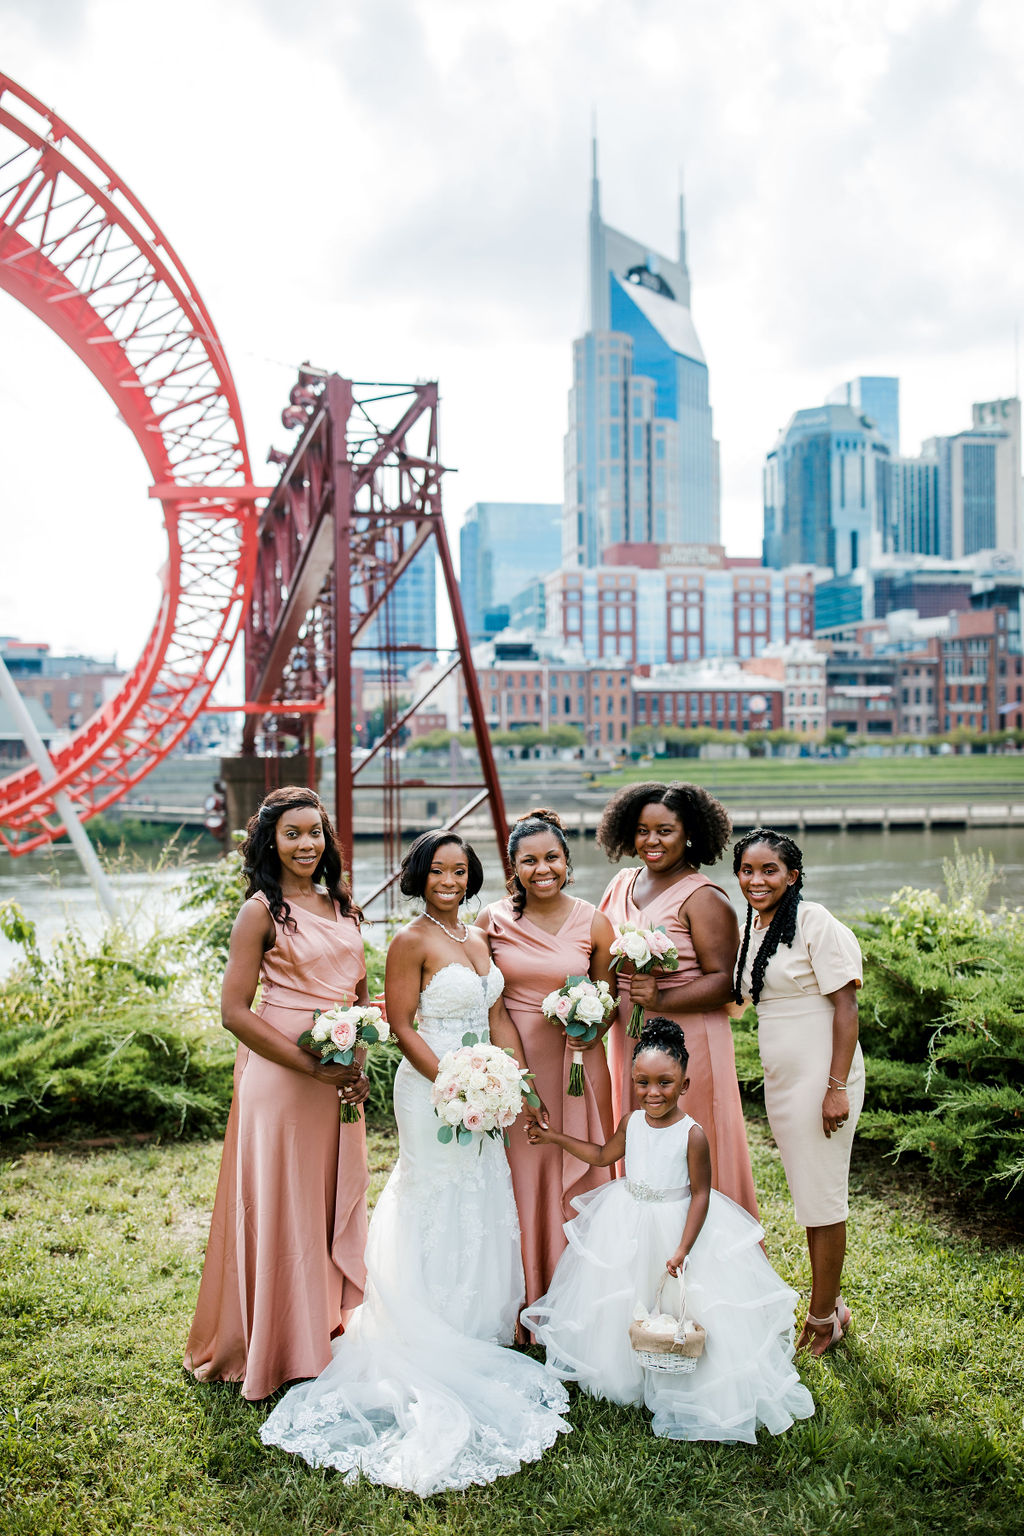 Pink bridesmaid dress designs | Nashville Bride Guide